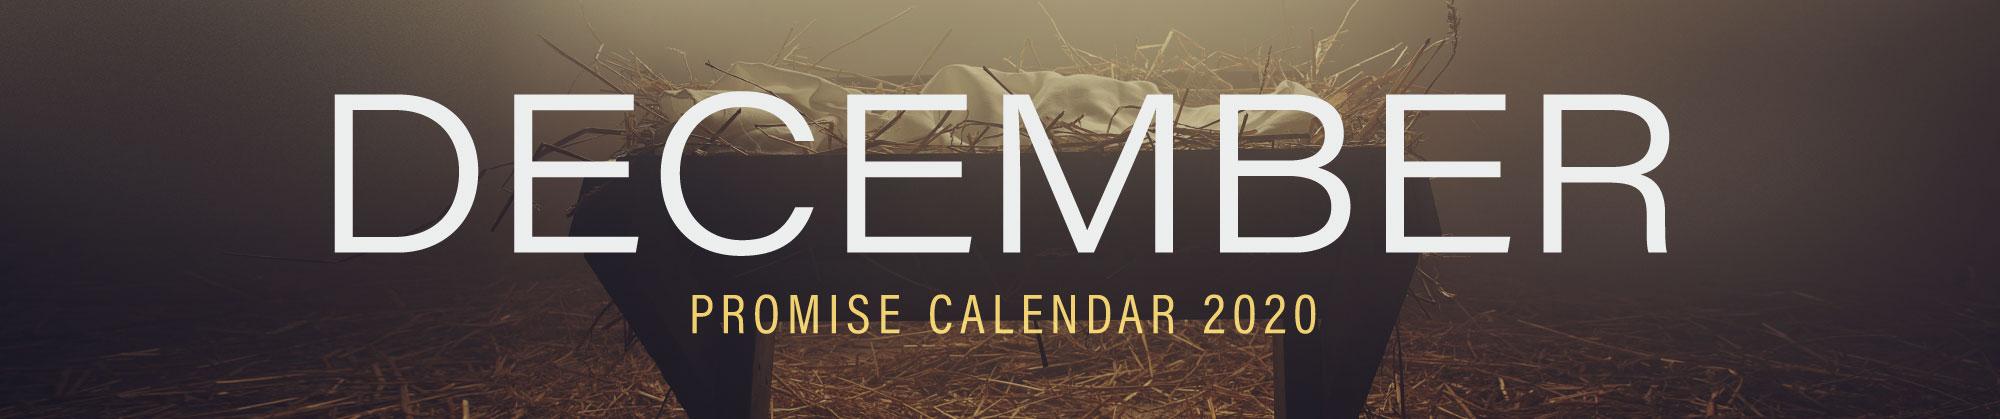 December 2020 Promise Calendar Header